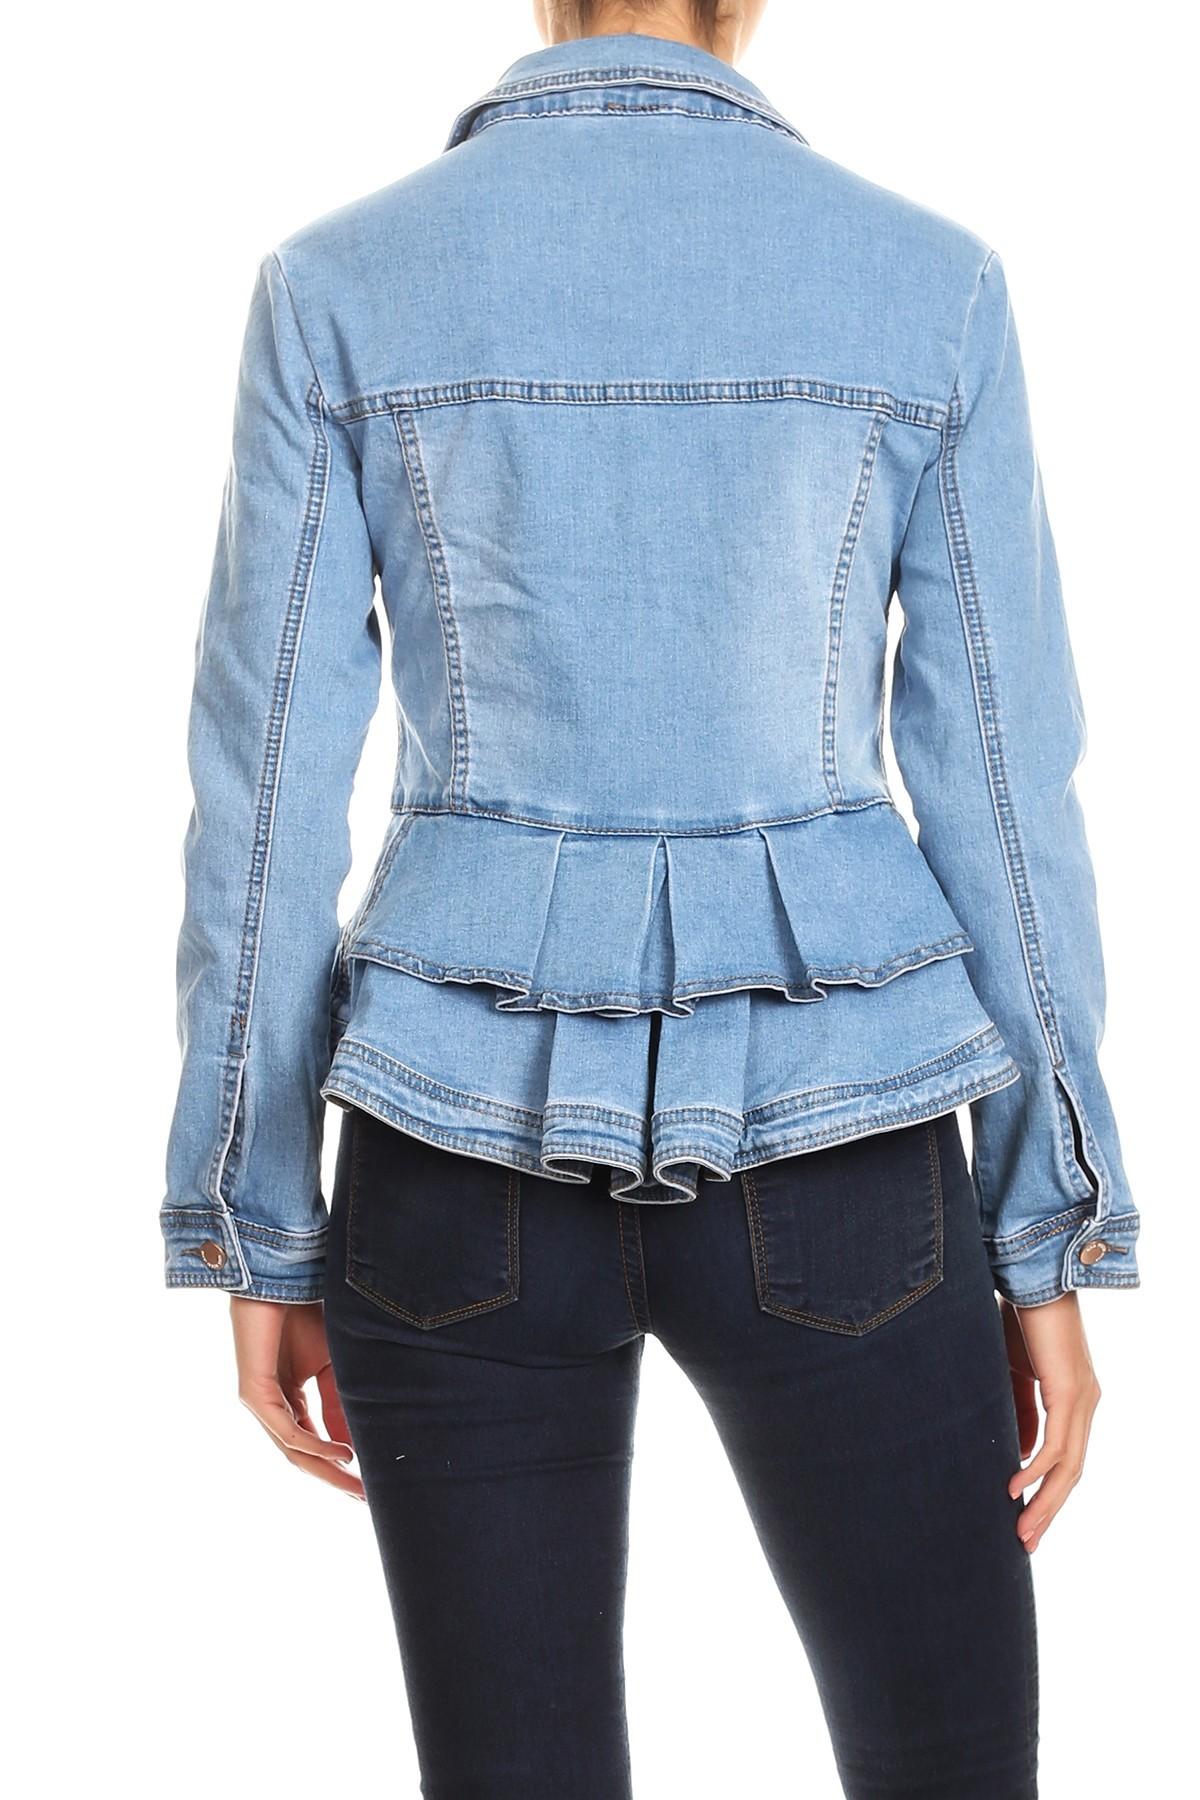 Women-039-s-Juniors-Premium-Denim-Peplum-Bodice-Long-Sleeve-Jacket thumbnail 16